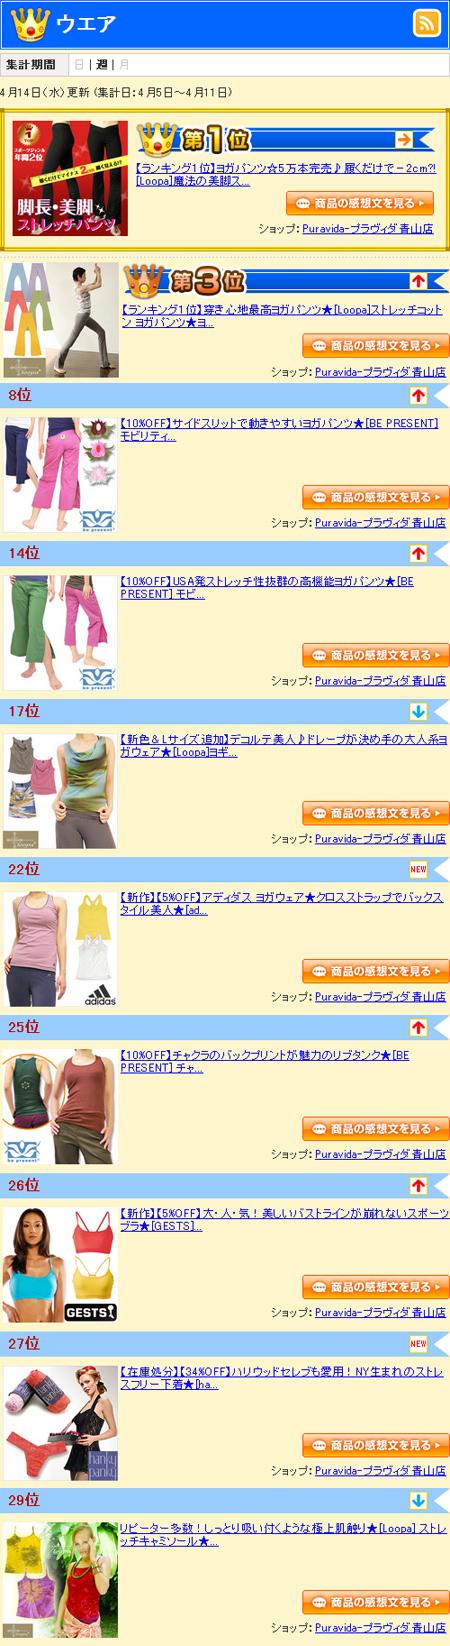 blog-0415.jpg